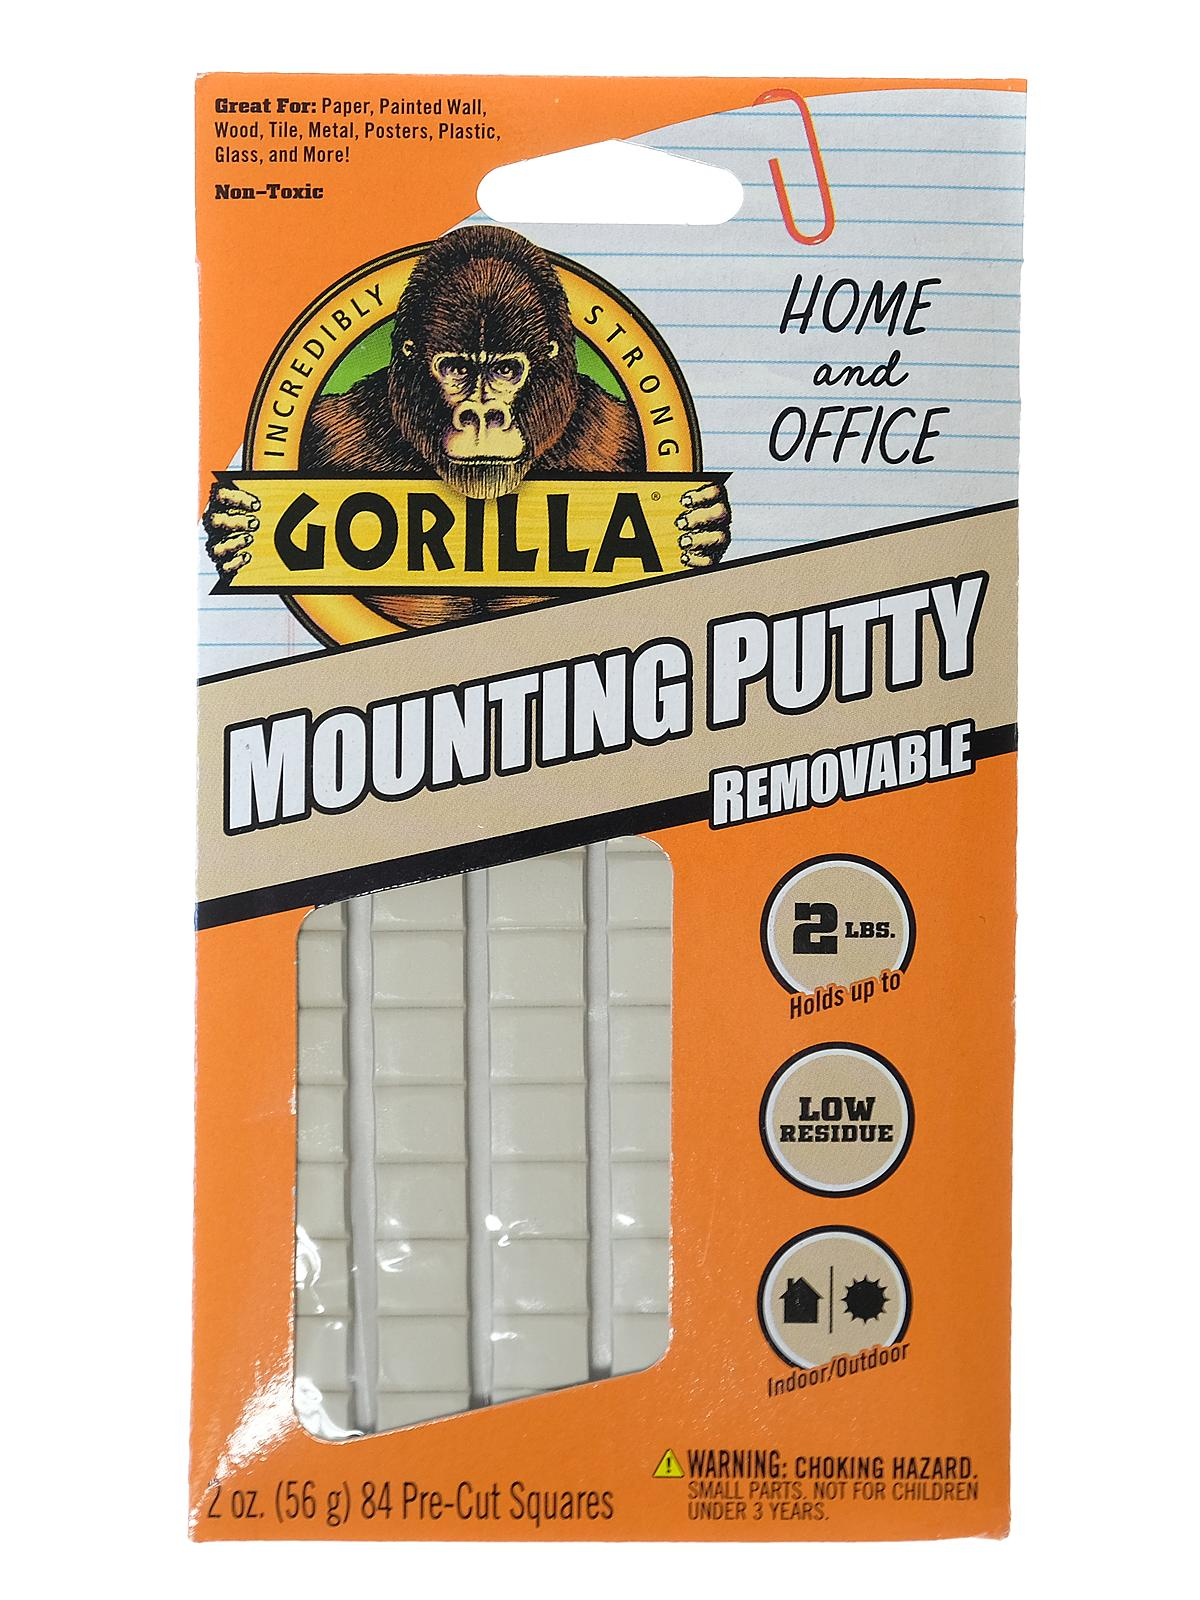 The Gorilla Glue Company - Mounting Putty